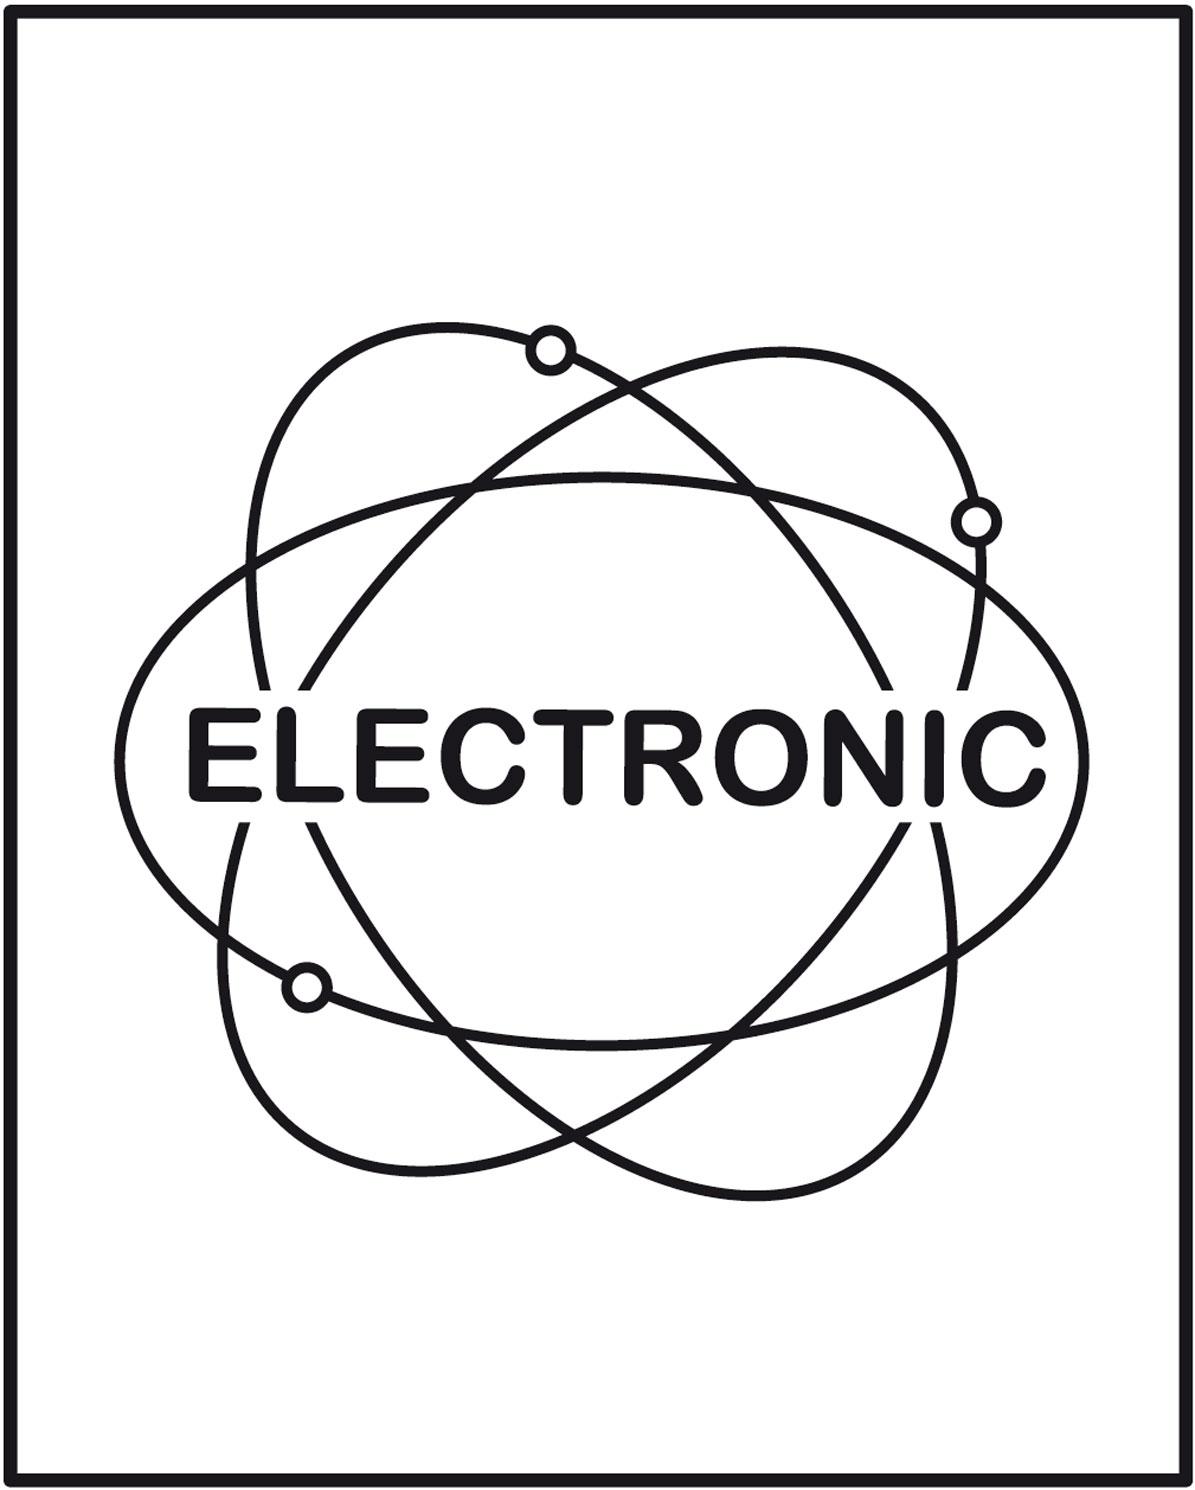 15_elektrotechnik__elektronik.jpg